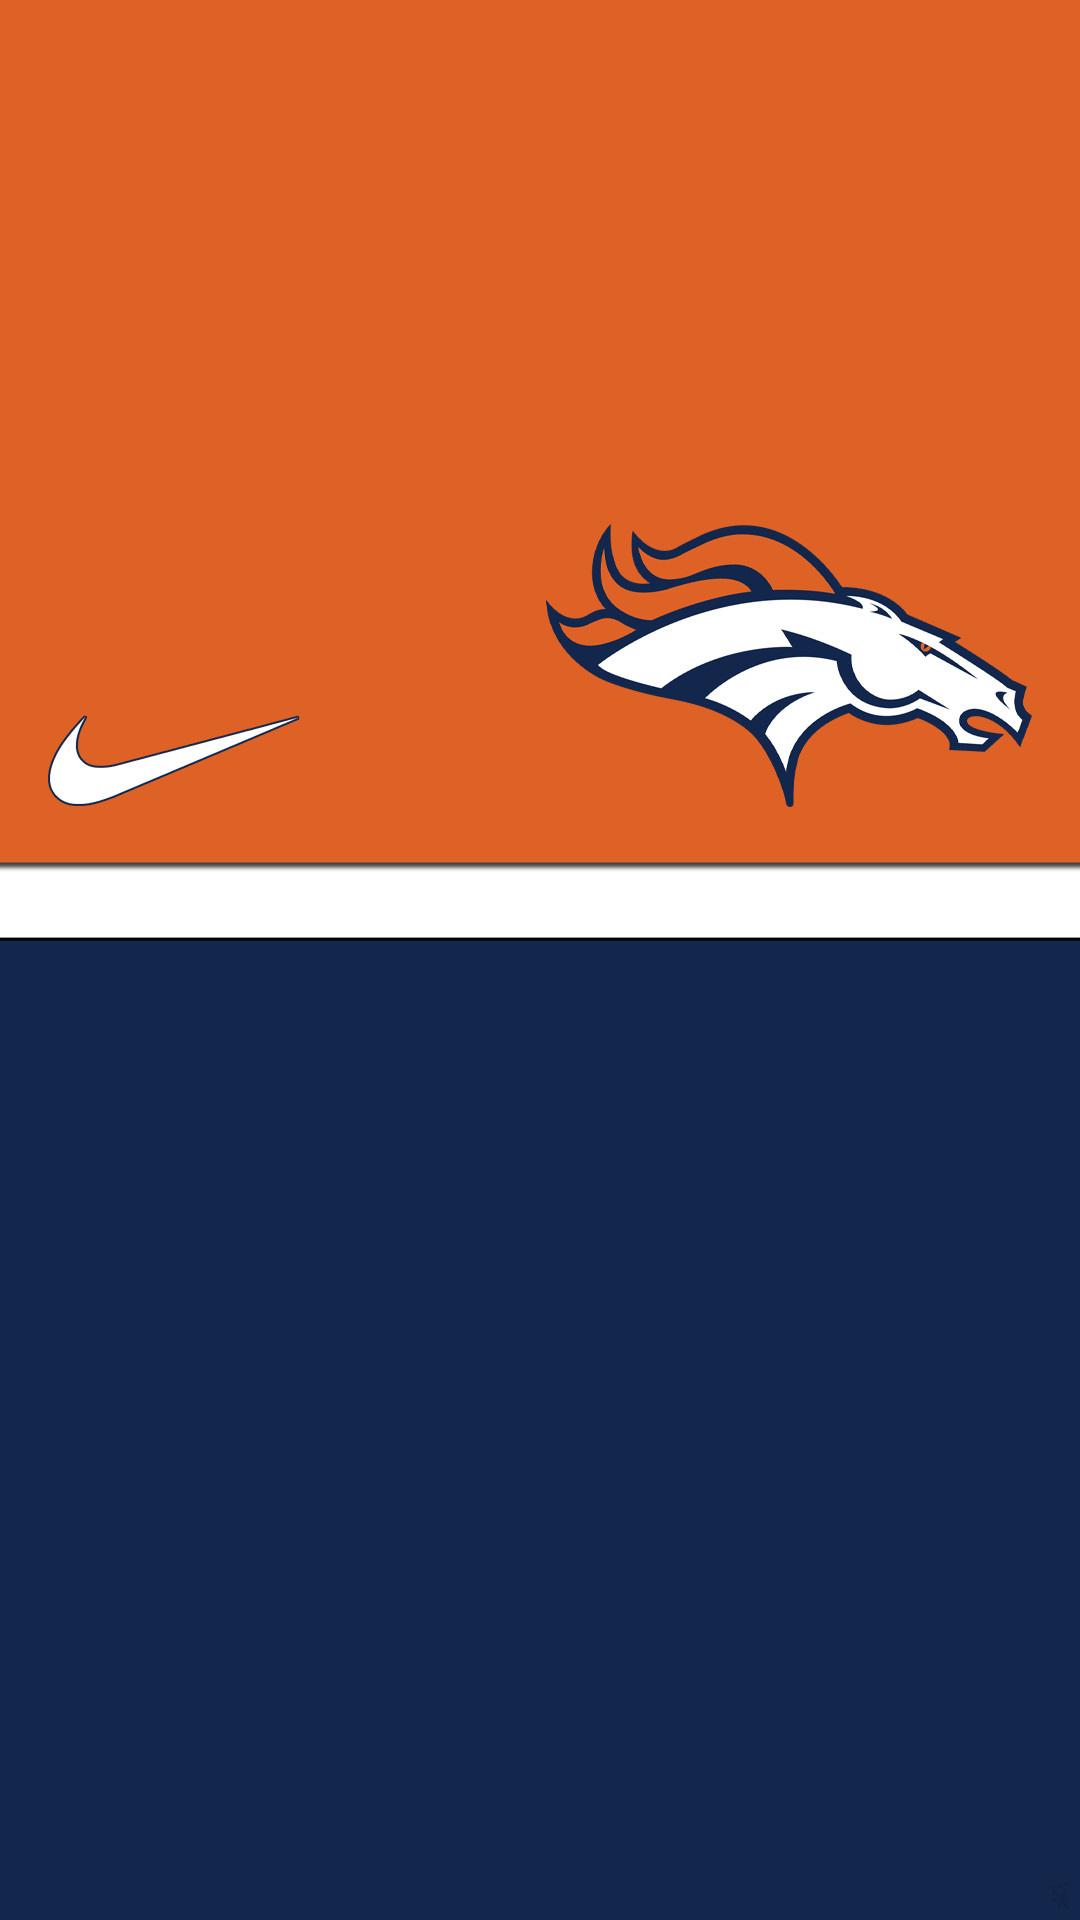 Cool Denver Broncos Wallpapers (76+ images)